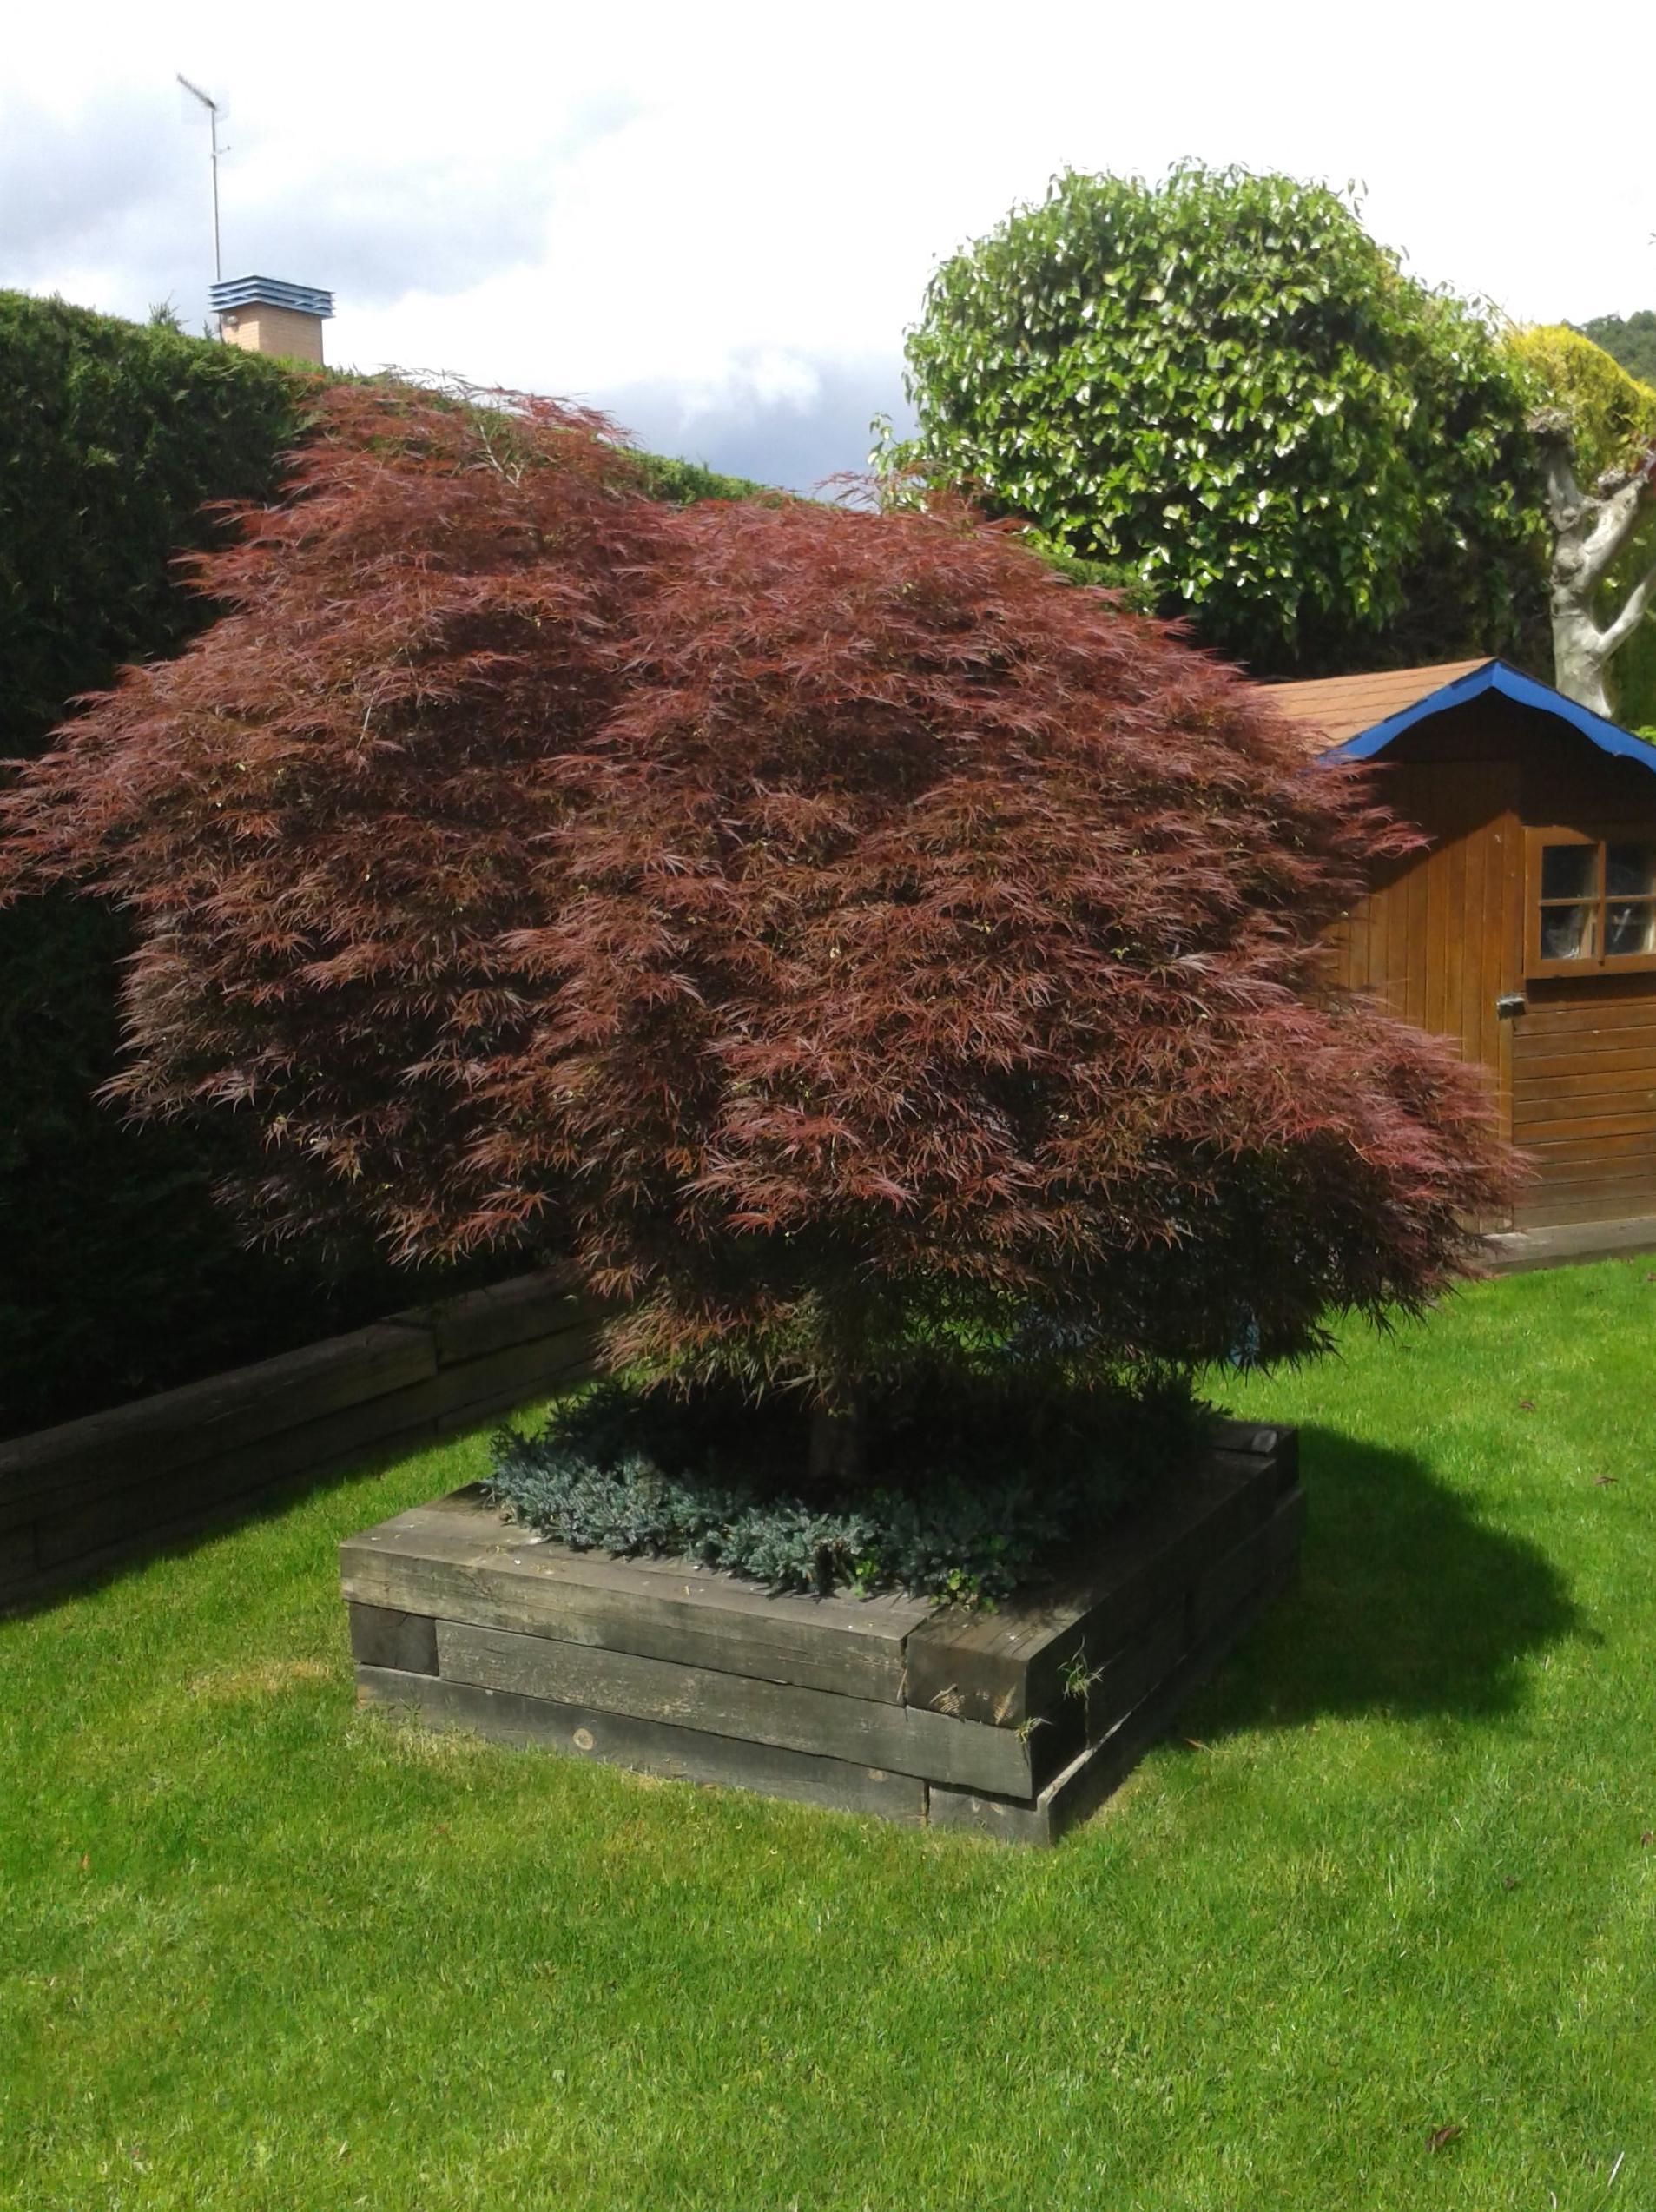 arce japones diseño decoracion cesped traviesas arbusto arbol planta caseta jardin